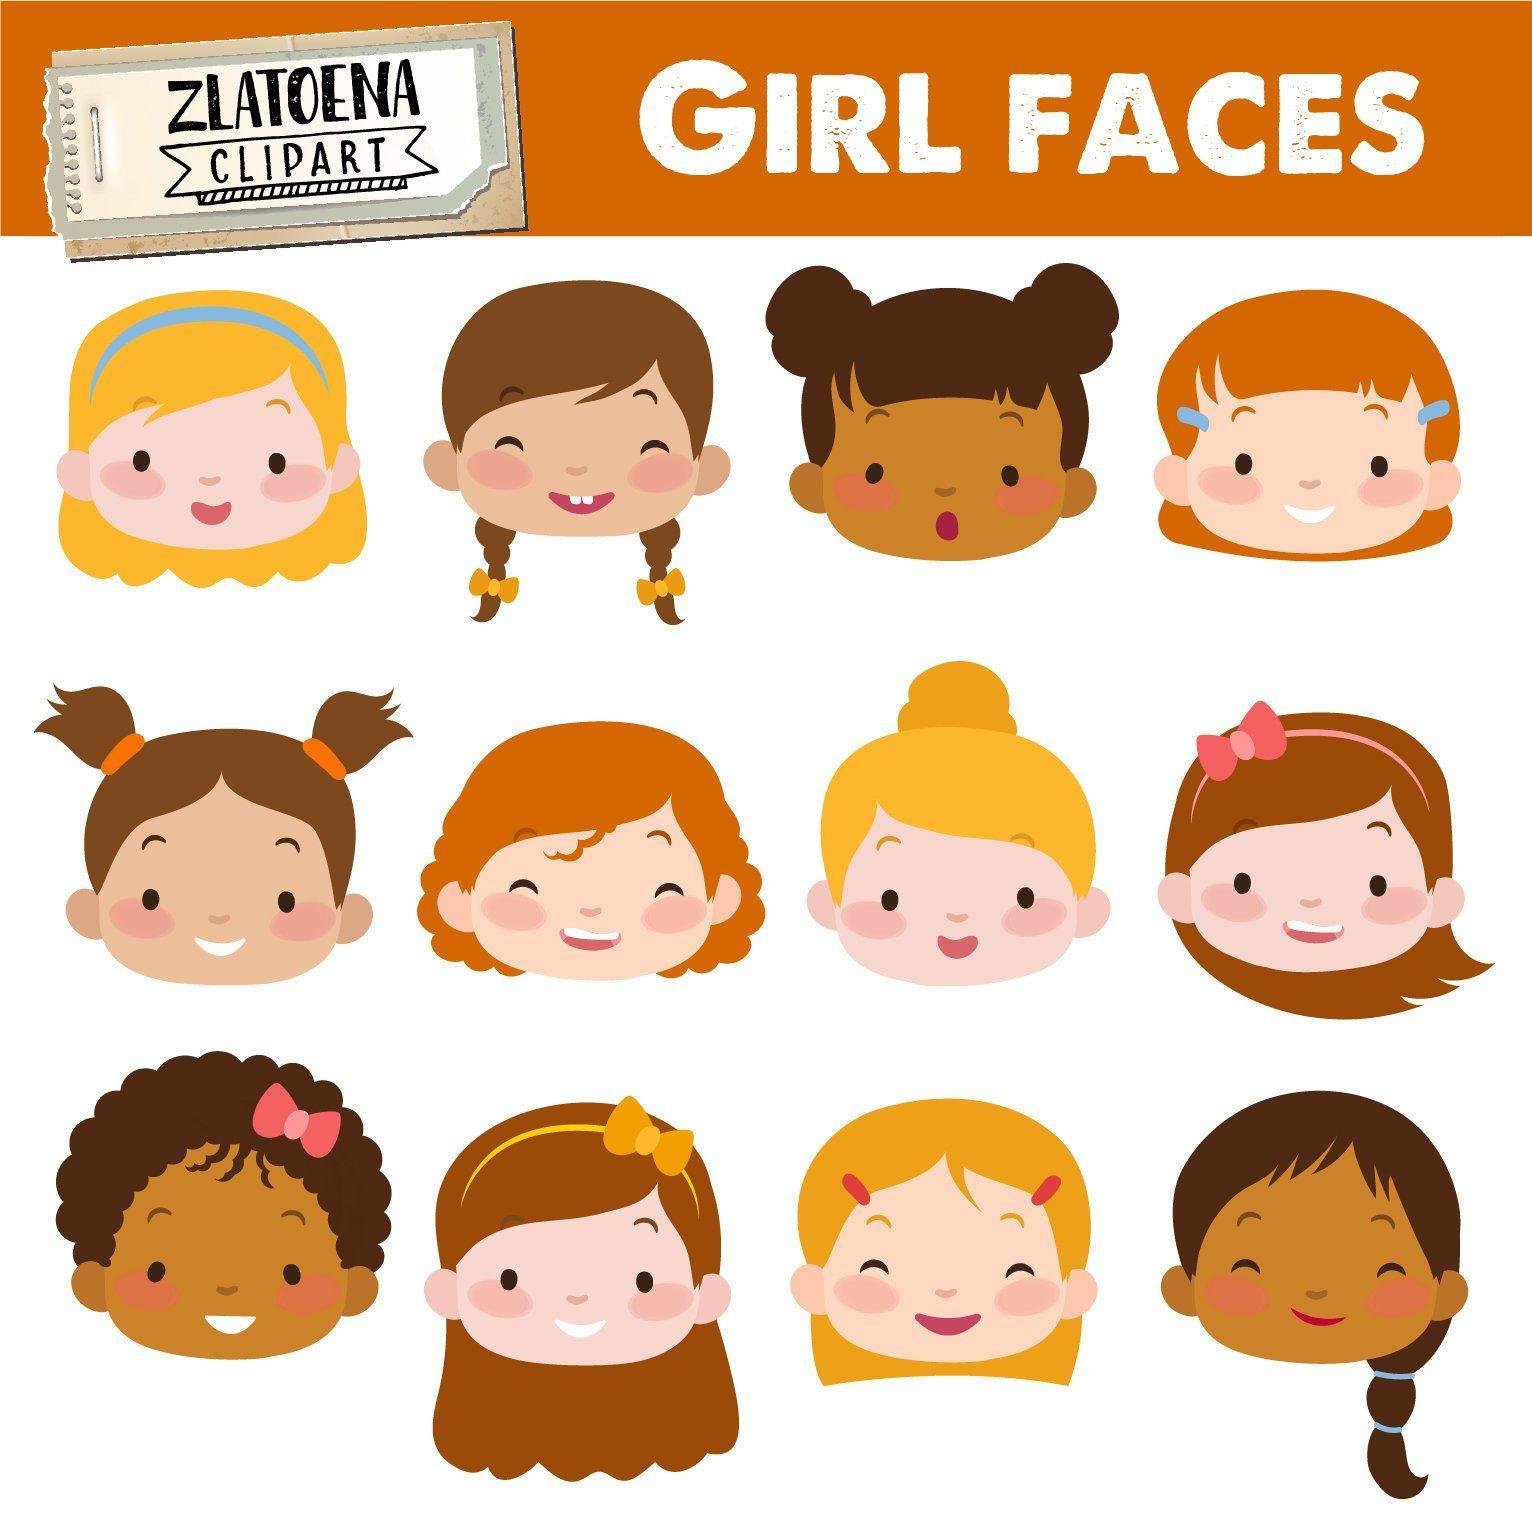 Faces clipart child face. Cute girl kids digital